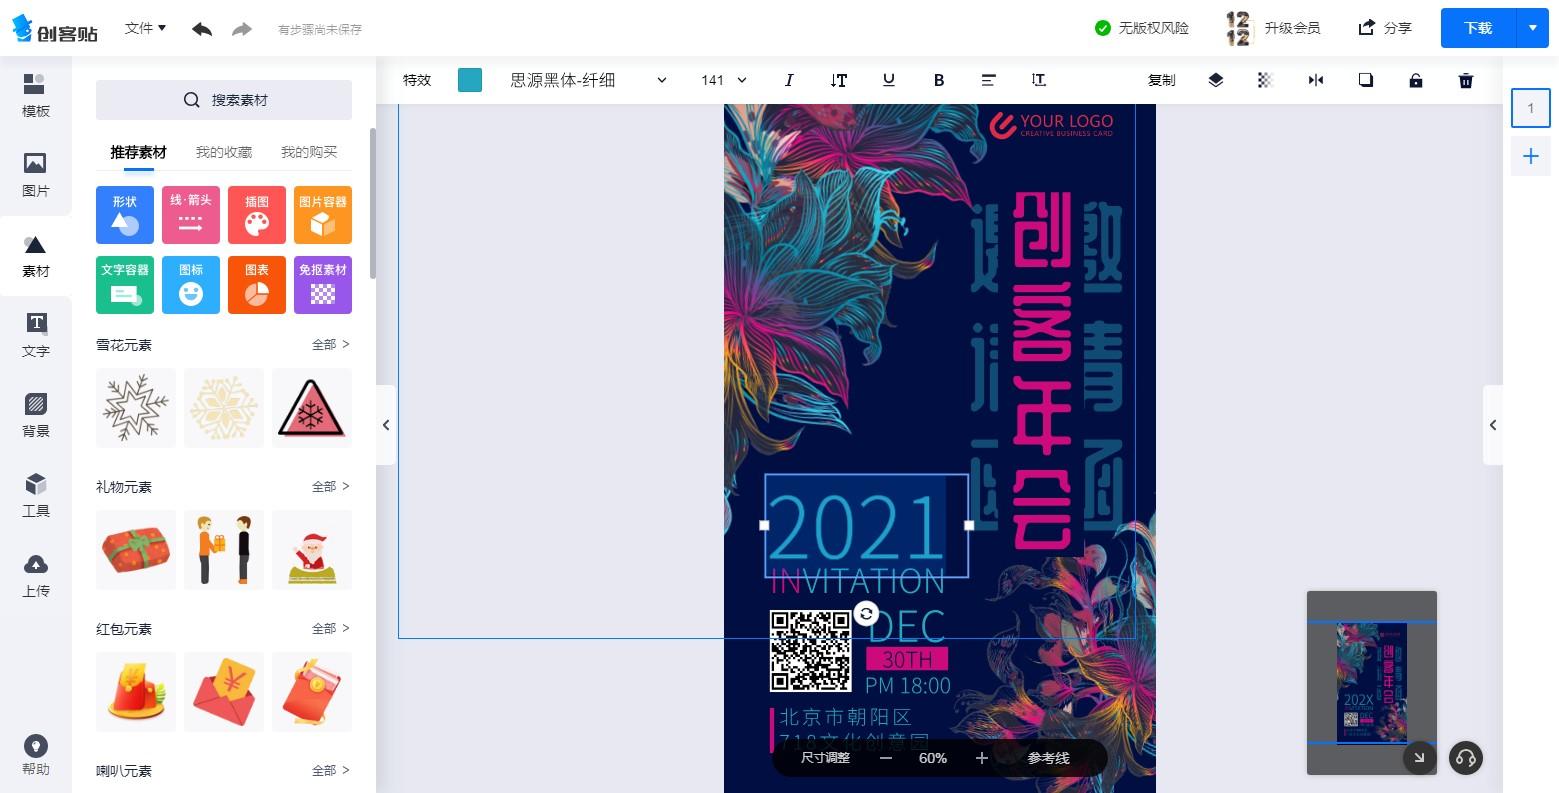 Dingtalk_20201203175656.jpg